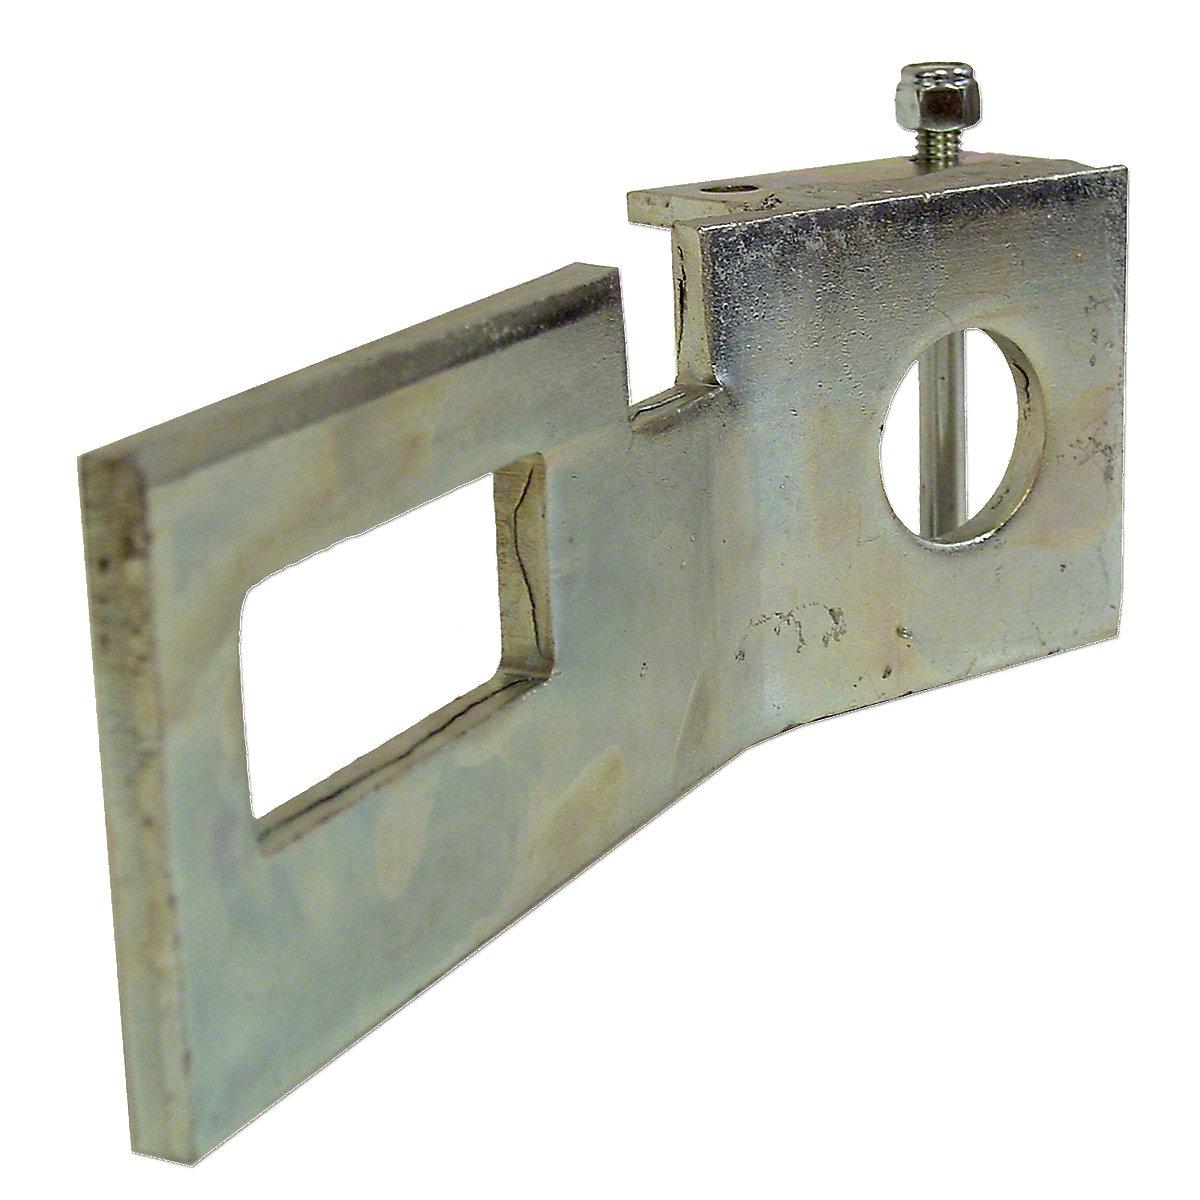 Category 1 Draw Bar Lock For Allis Chalmers: D10, D12, D15, ED40, I40, I400, I60, I600, 160, 5015, 5020, 5030, 5040, 5045, 5050, 6040, 6140.